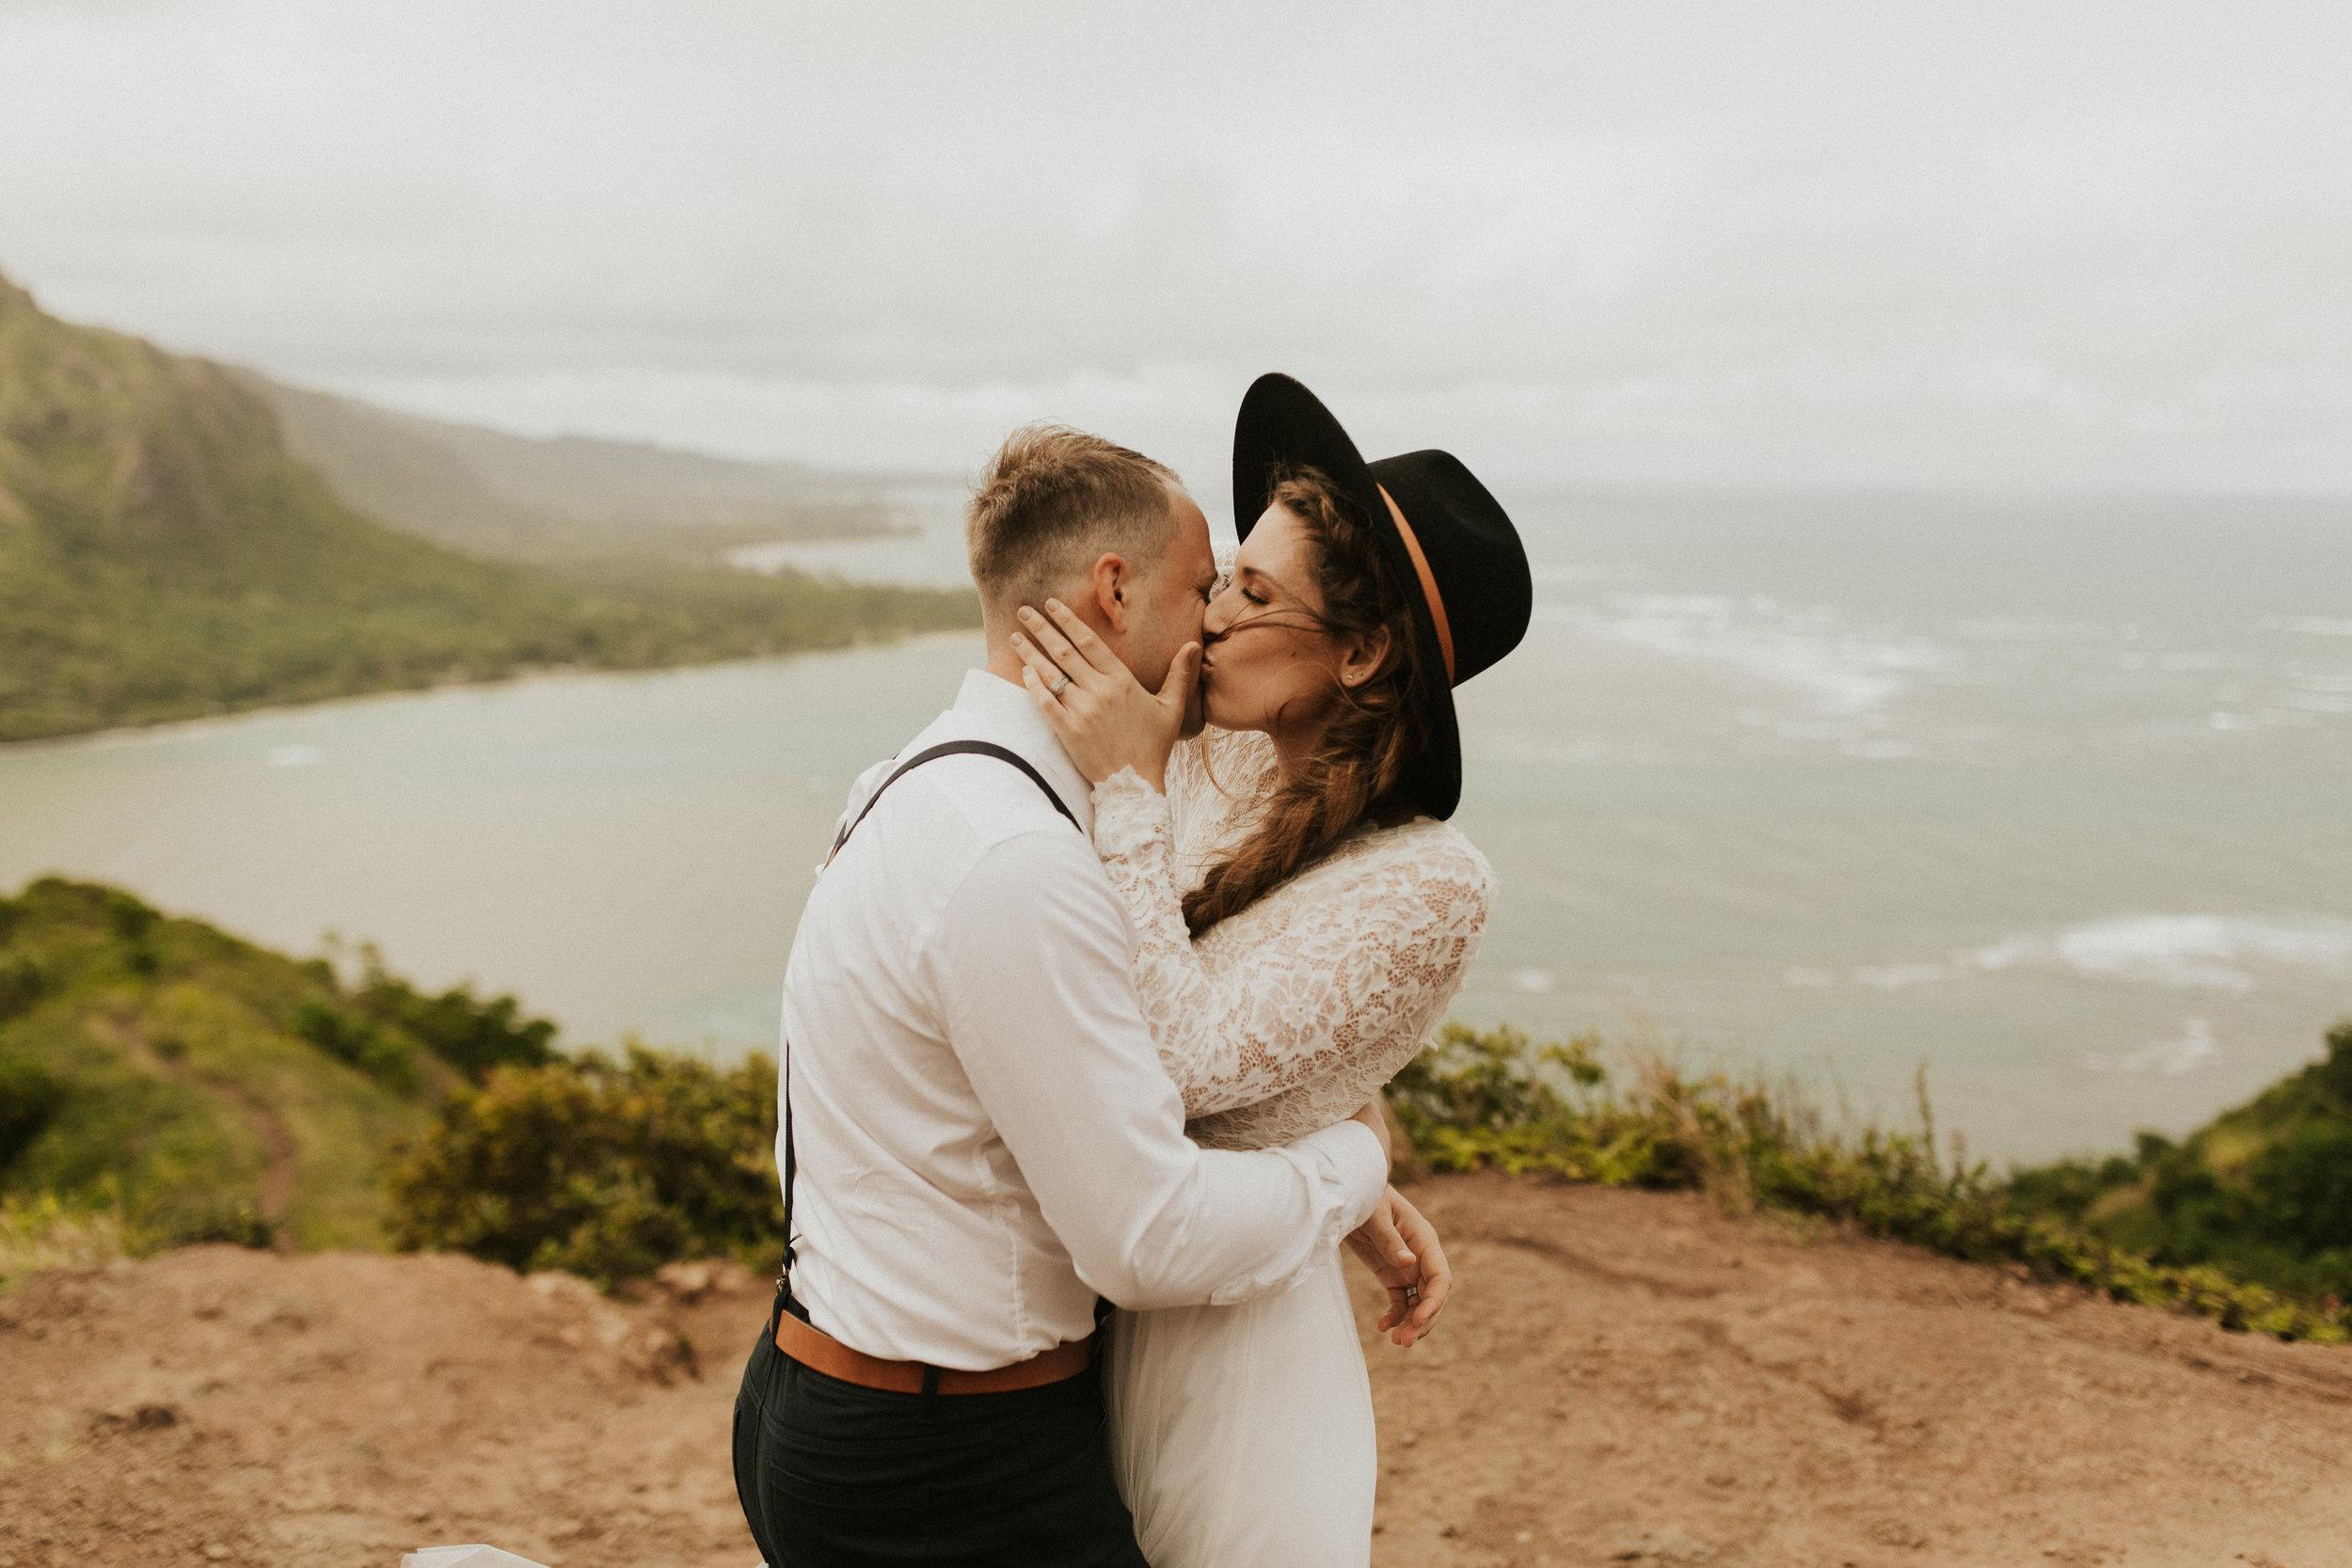 the-mclachlans-destination-elopement-photographers-mountain-hike-sena-eric-69.jpg